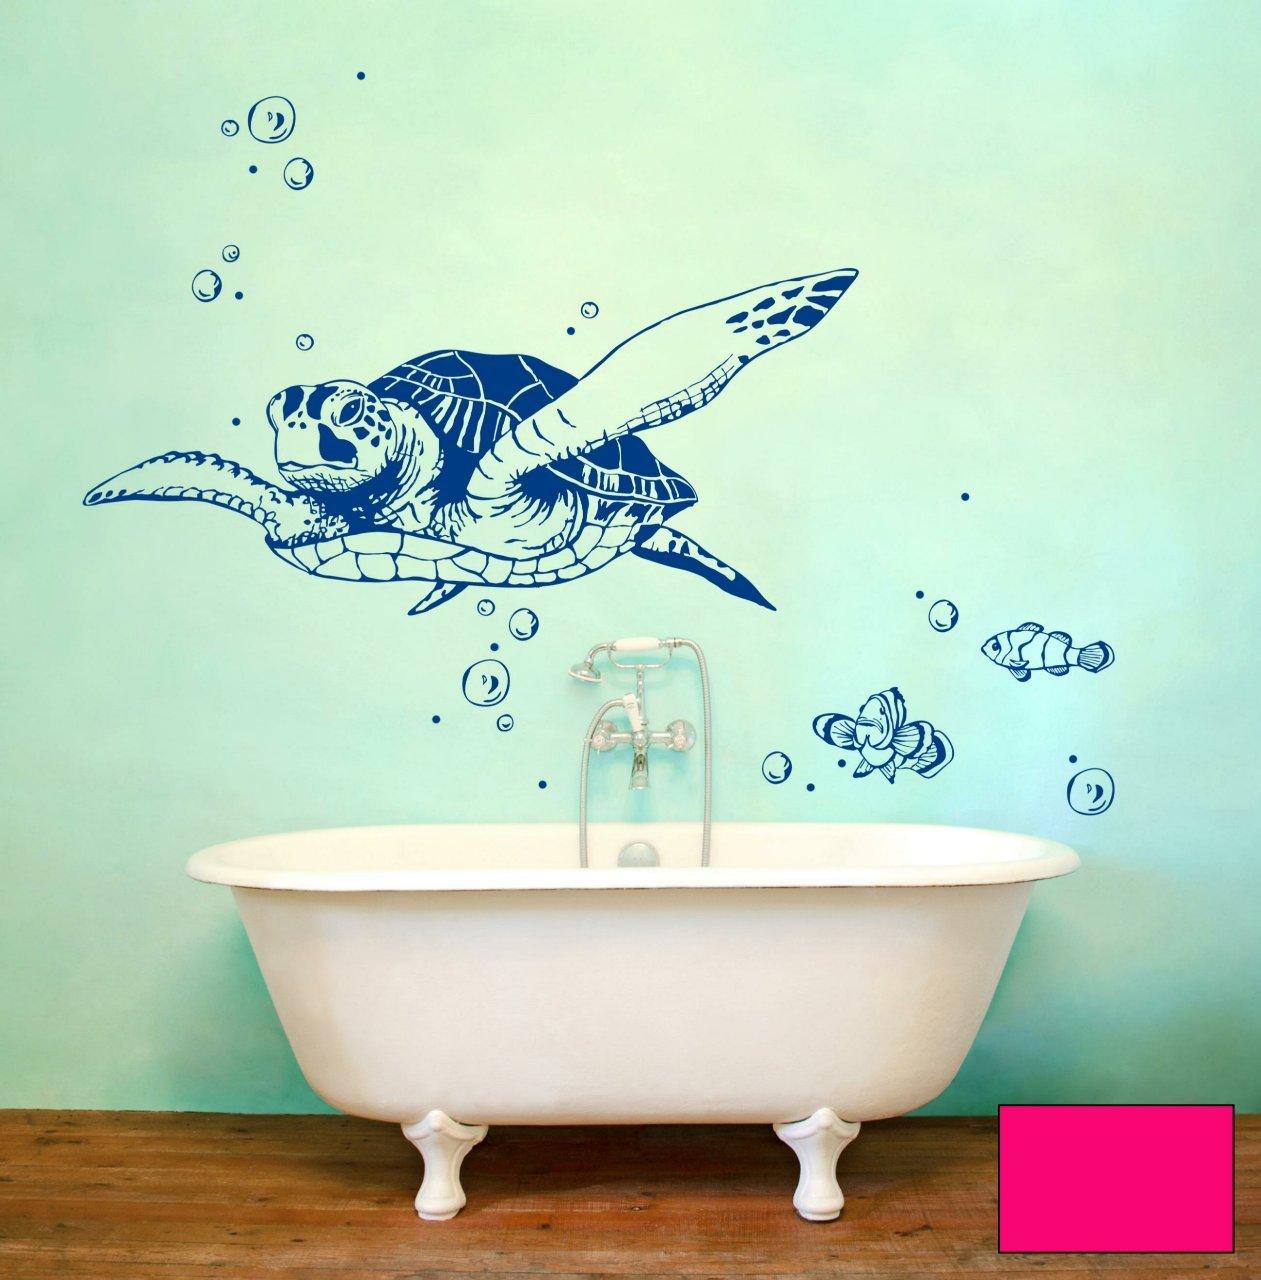 ilka parey wandtattoo-welt Graz Design - Adhesivo Decorativo para ...